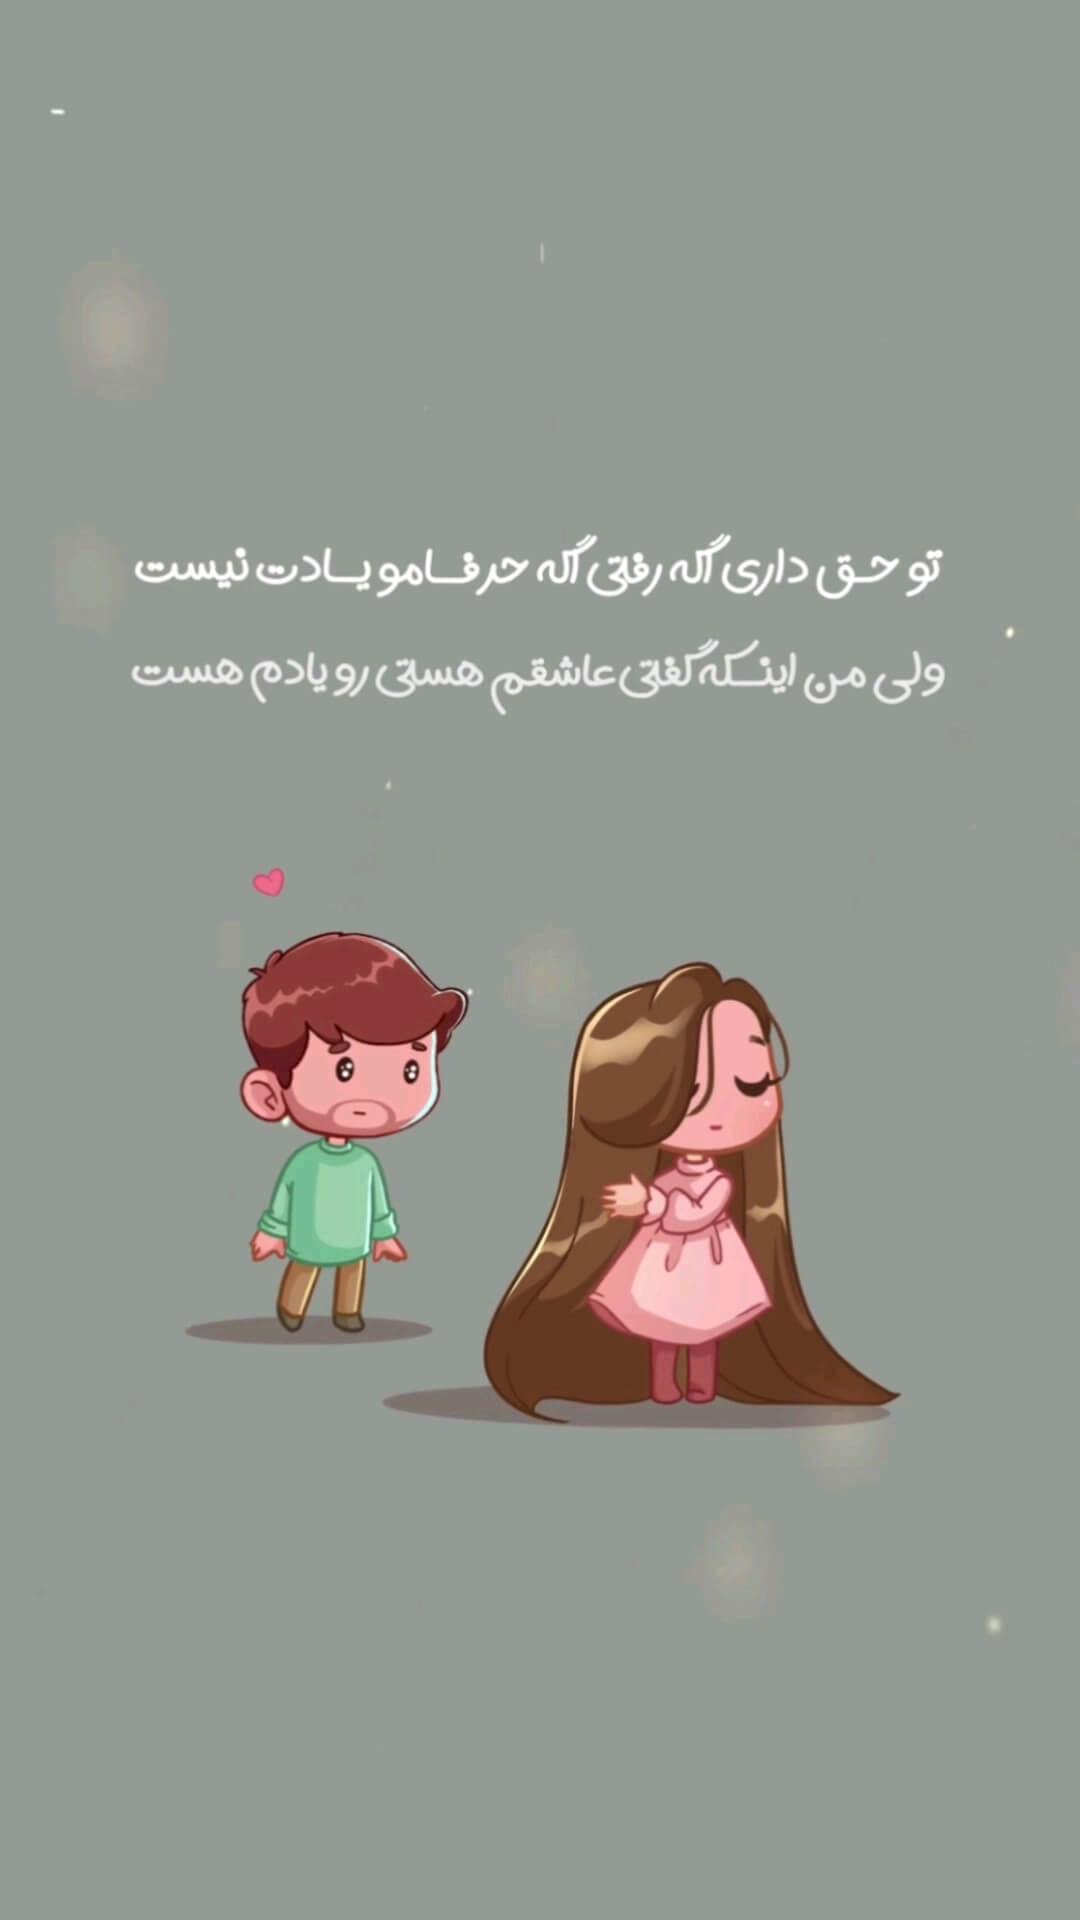 پروفایل عاشقانه آهنگ محسن چاوشی